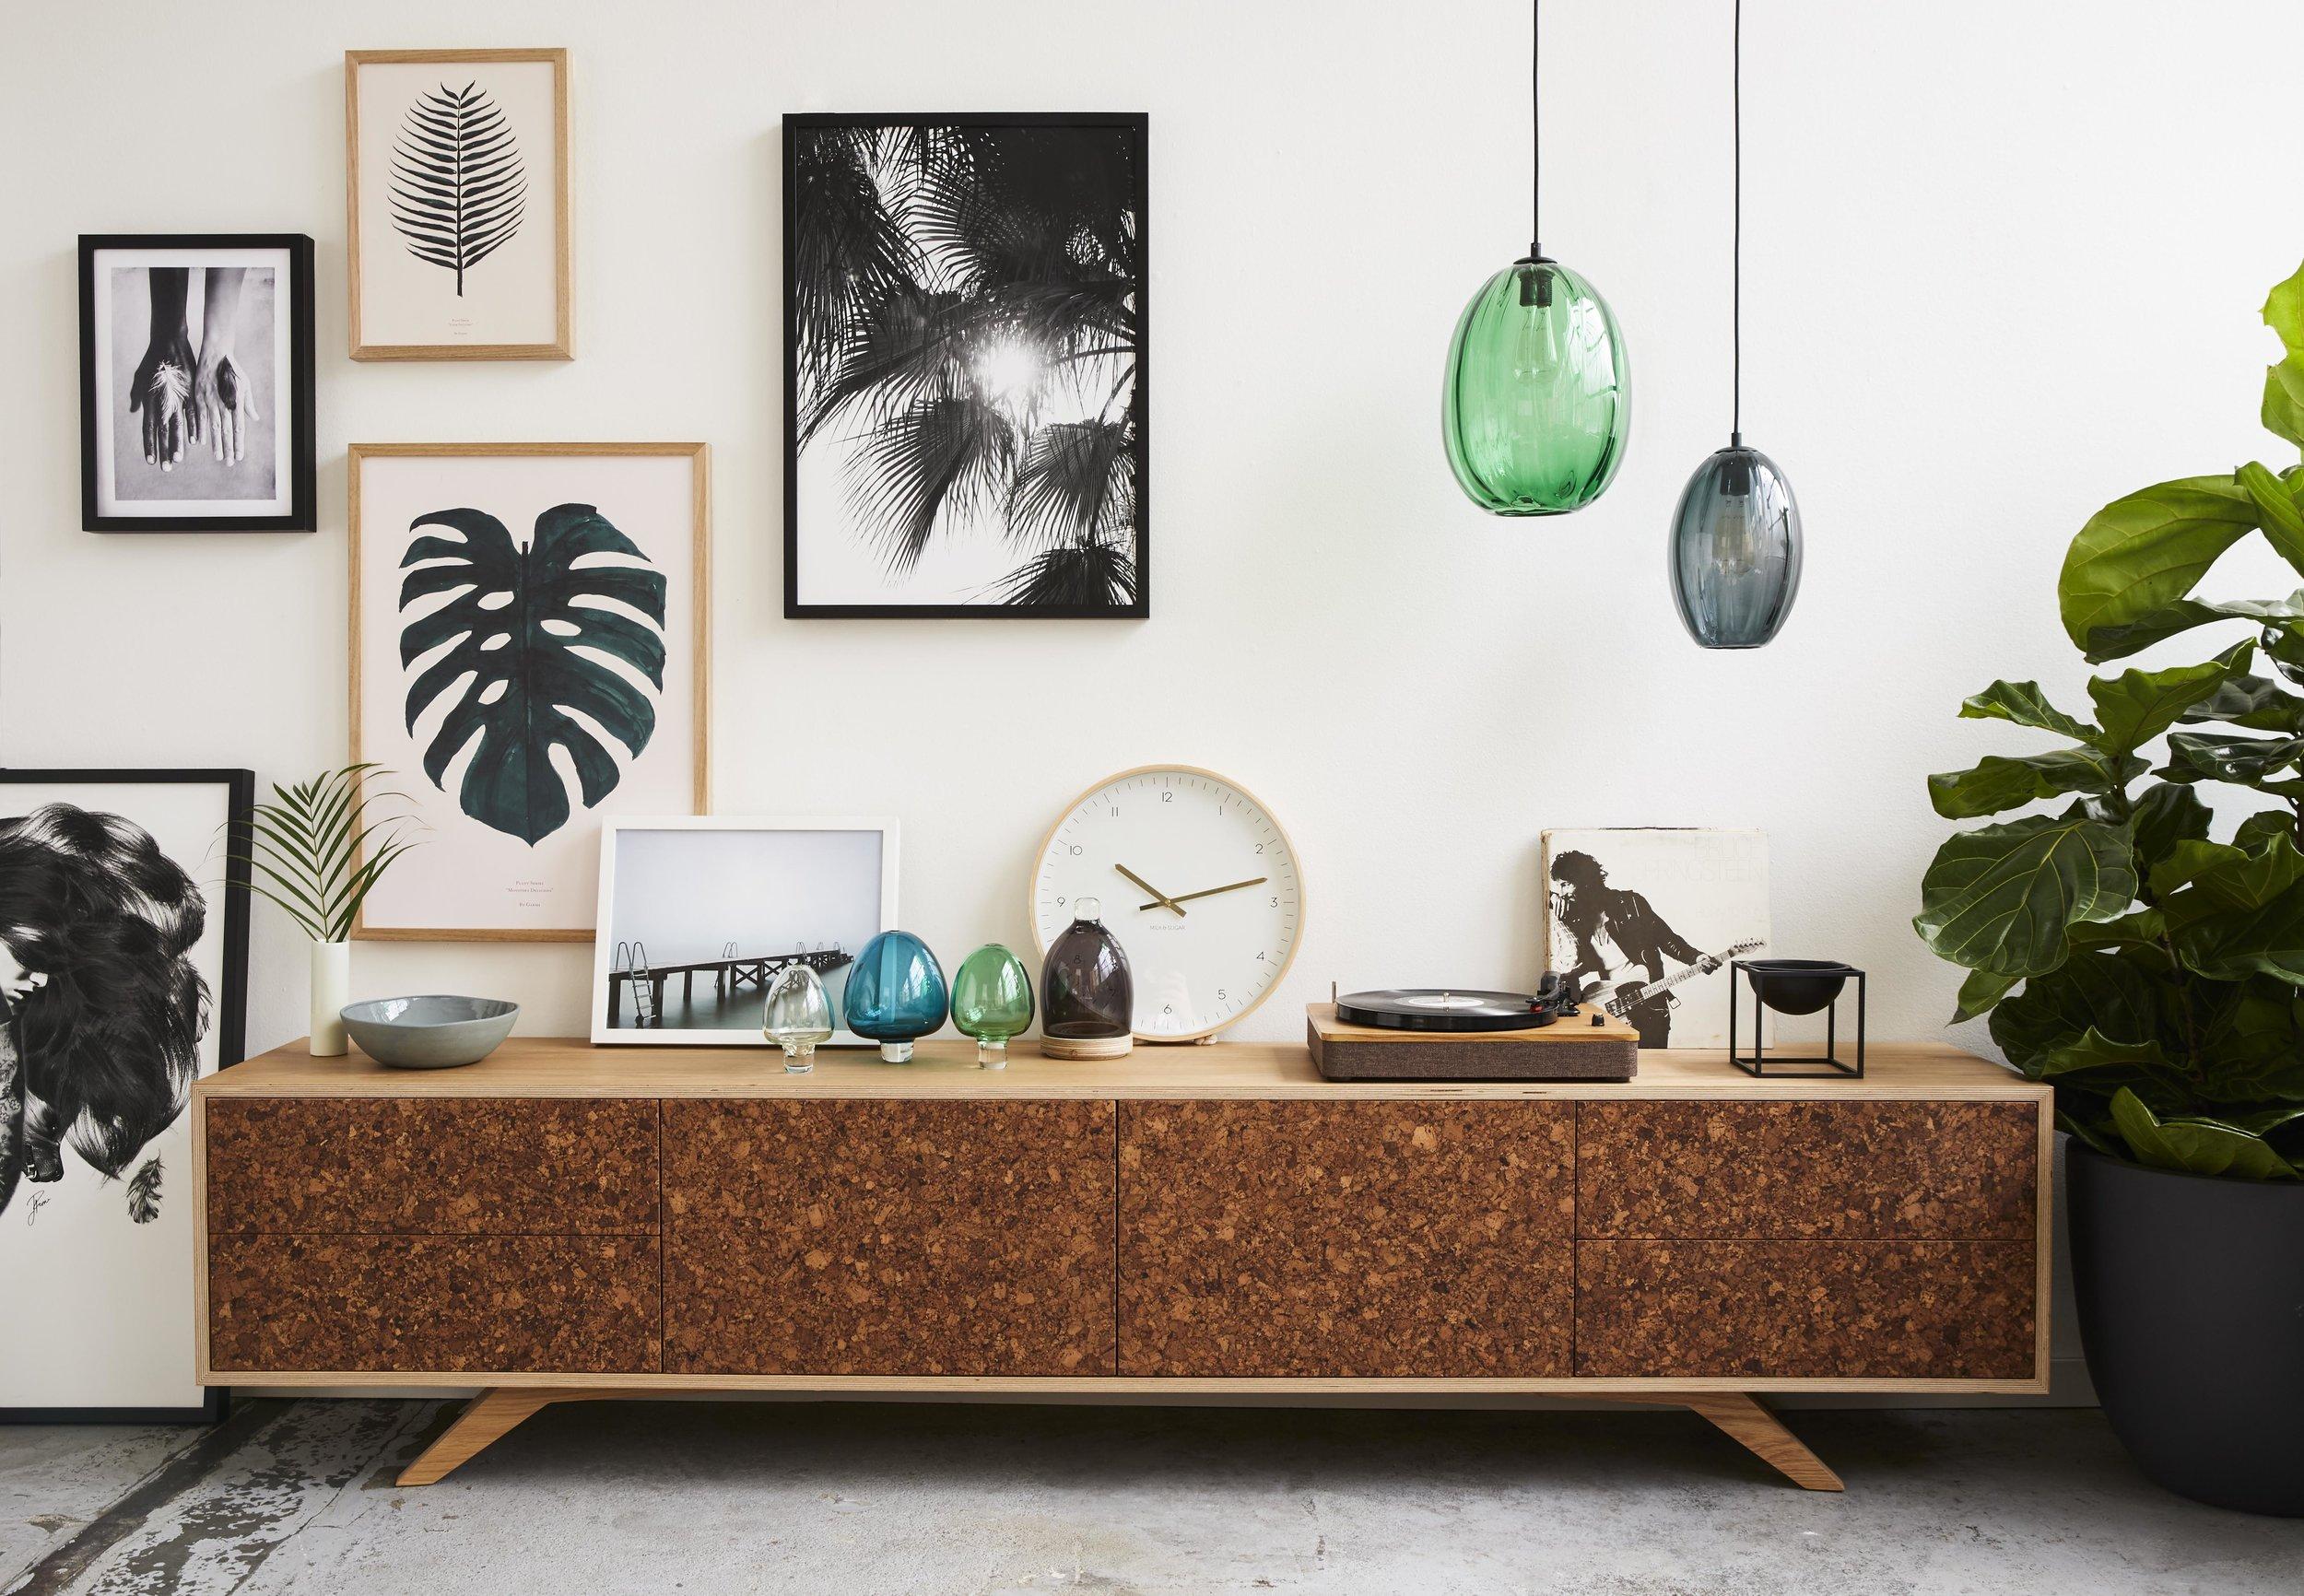 Maitland Street Interiors, Sarah Elshaug, Interior Stylist Melbourne, Felix Furniture Lifestyle Campaign